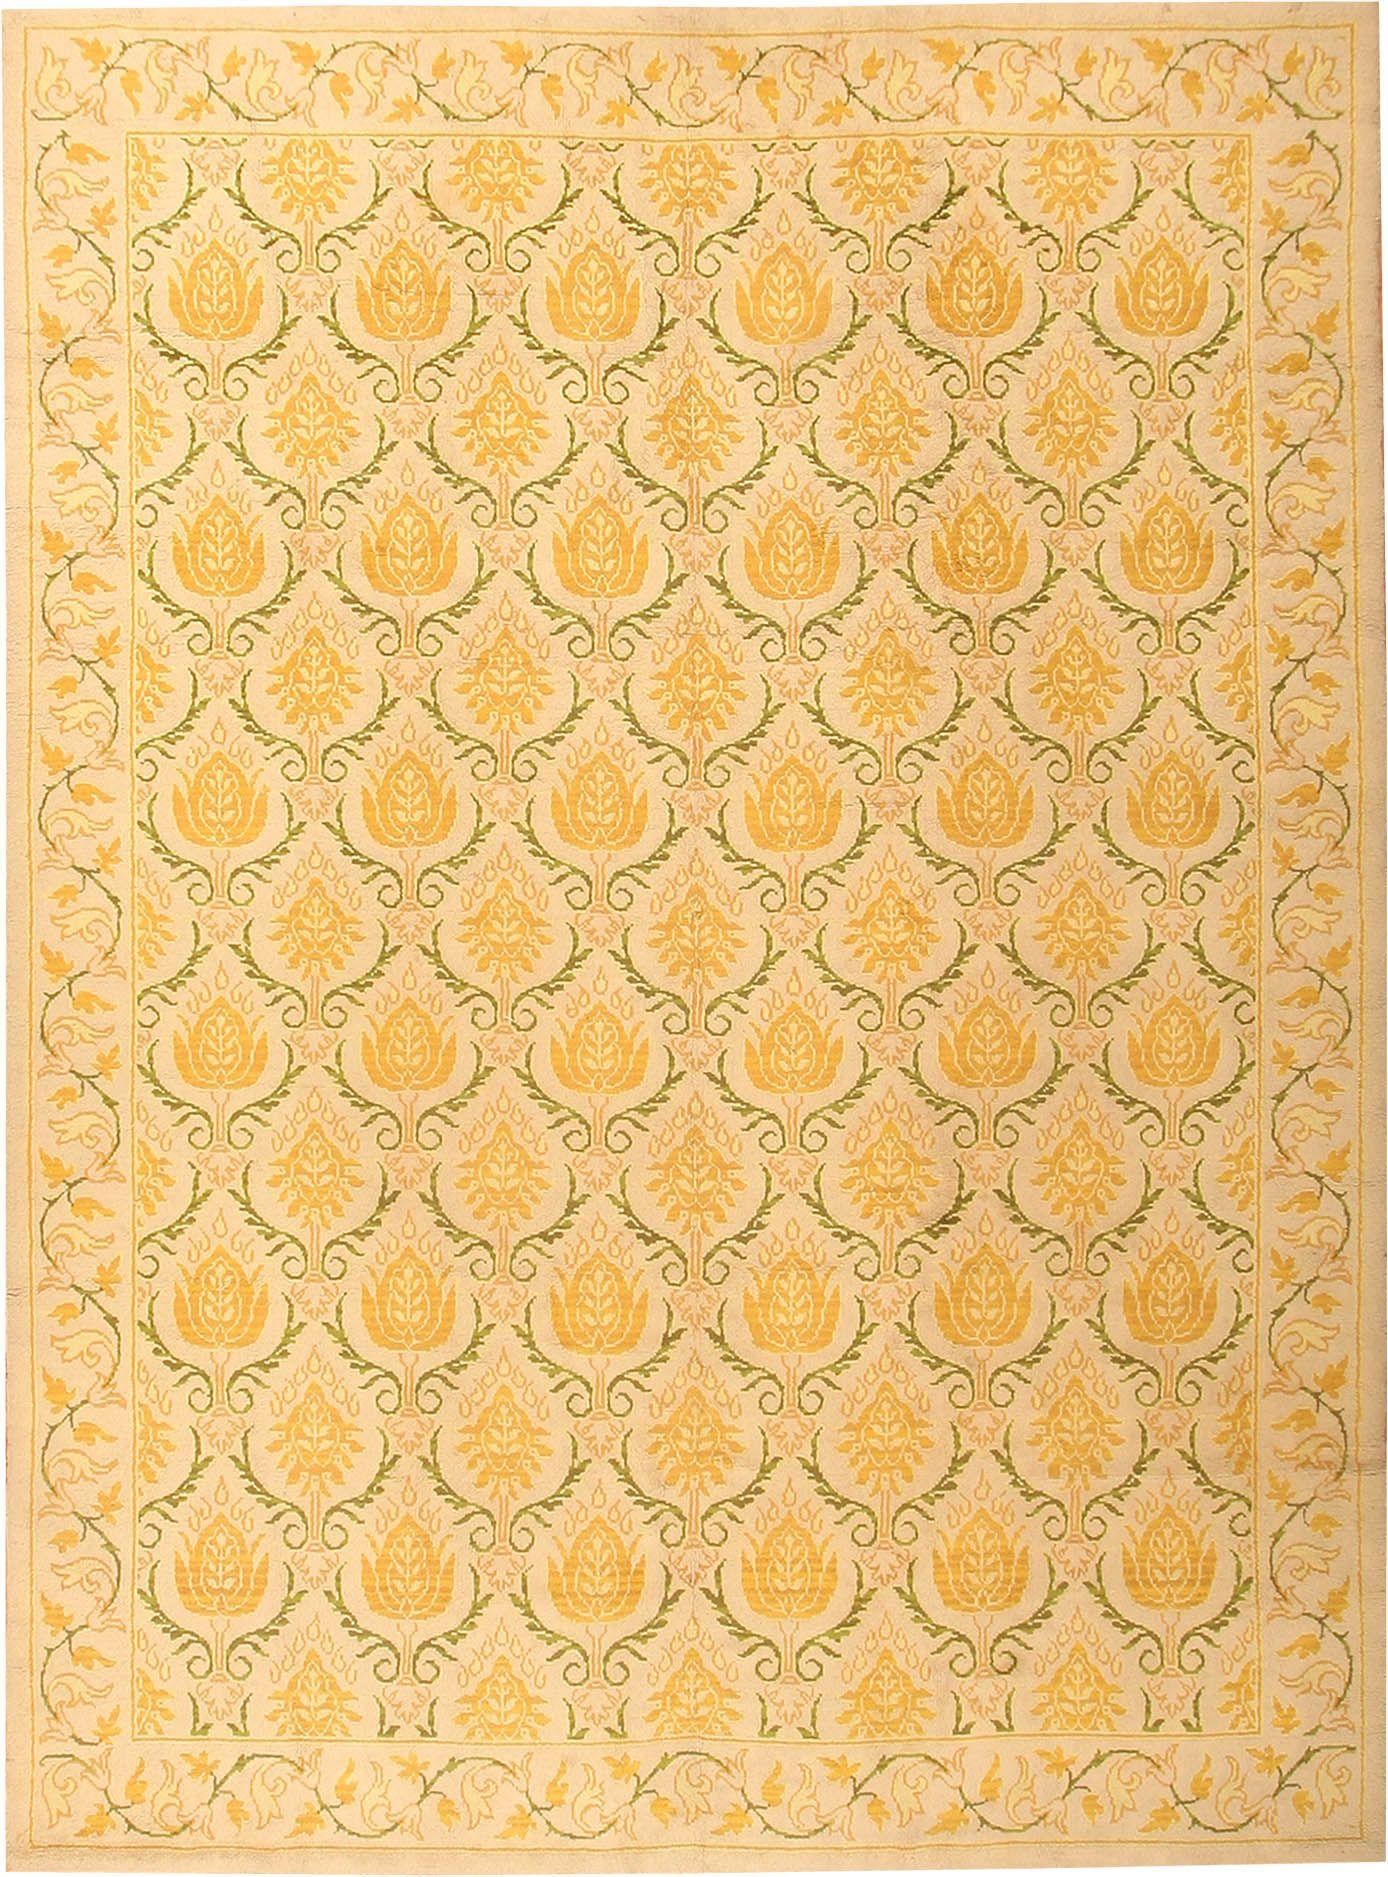 Art Deco Spanish Carpets 2943 Nazmiyal Antique Rugs Art Deco